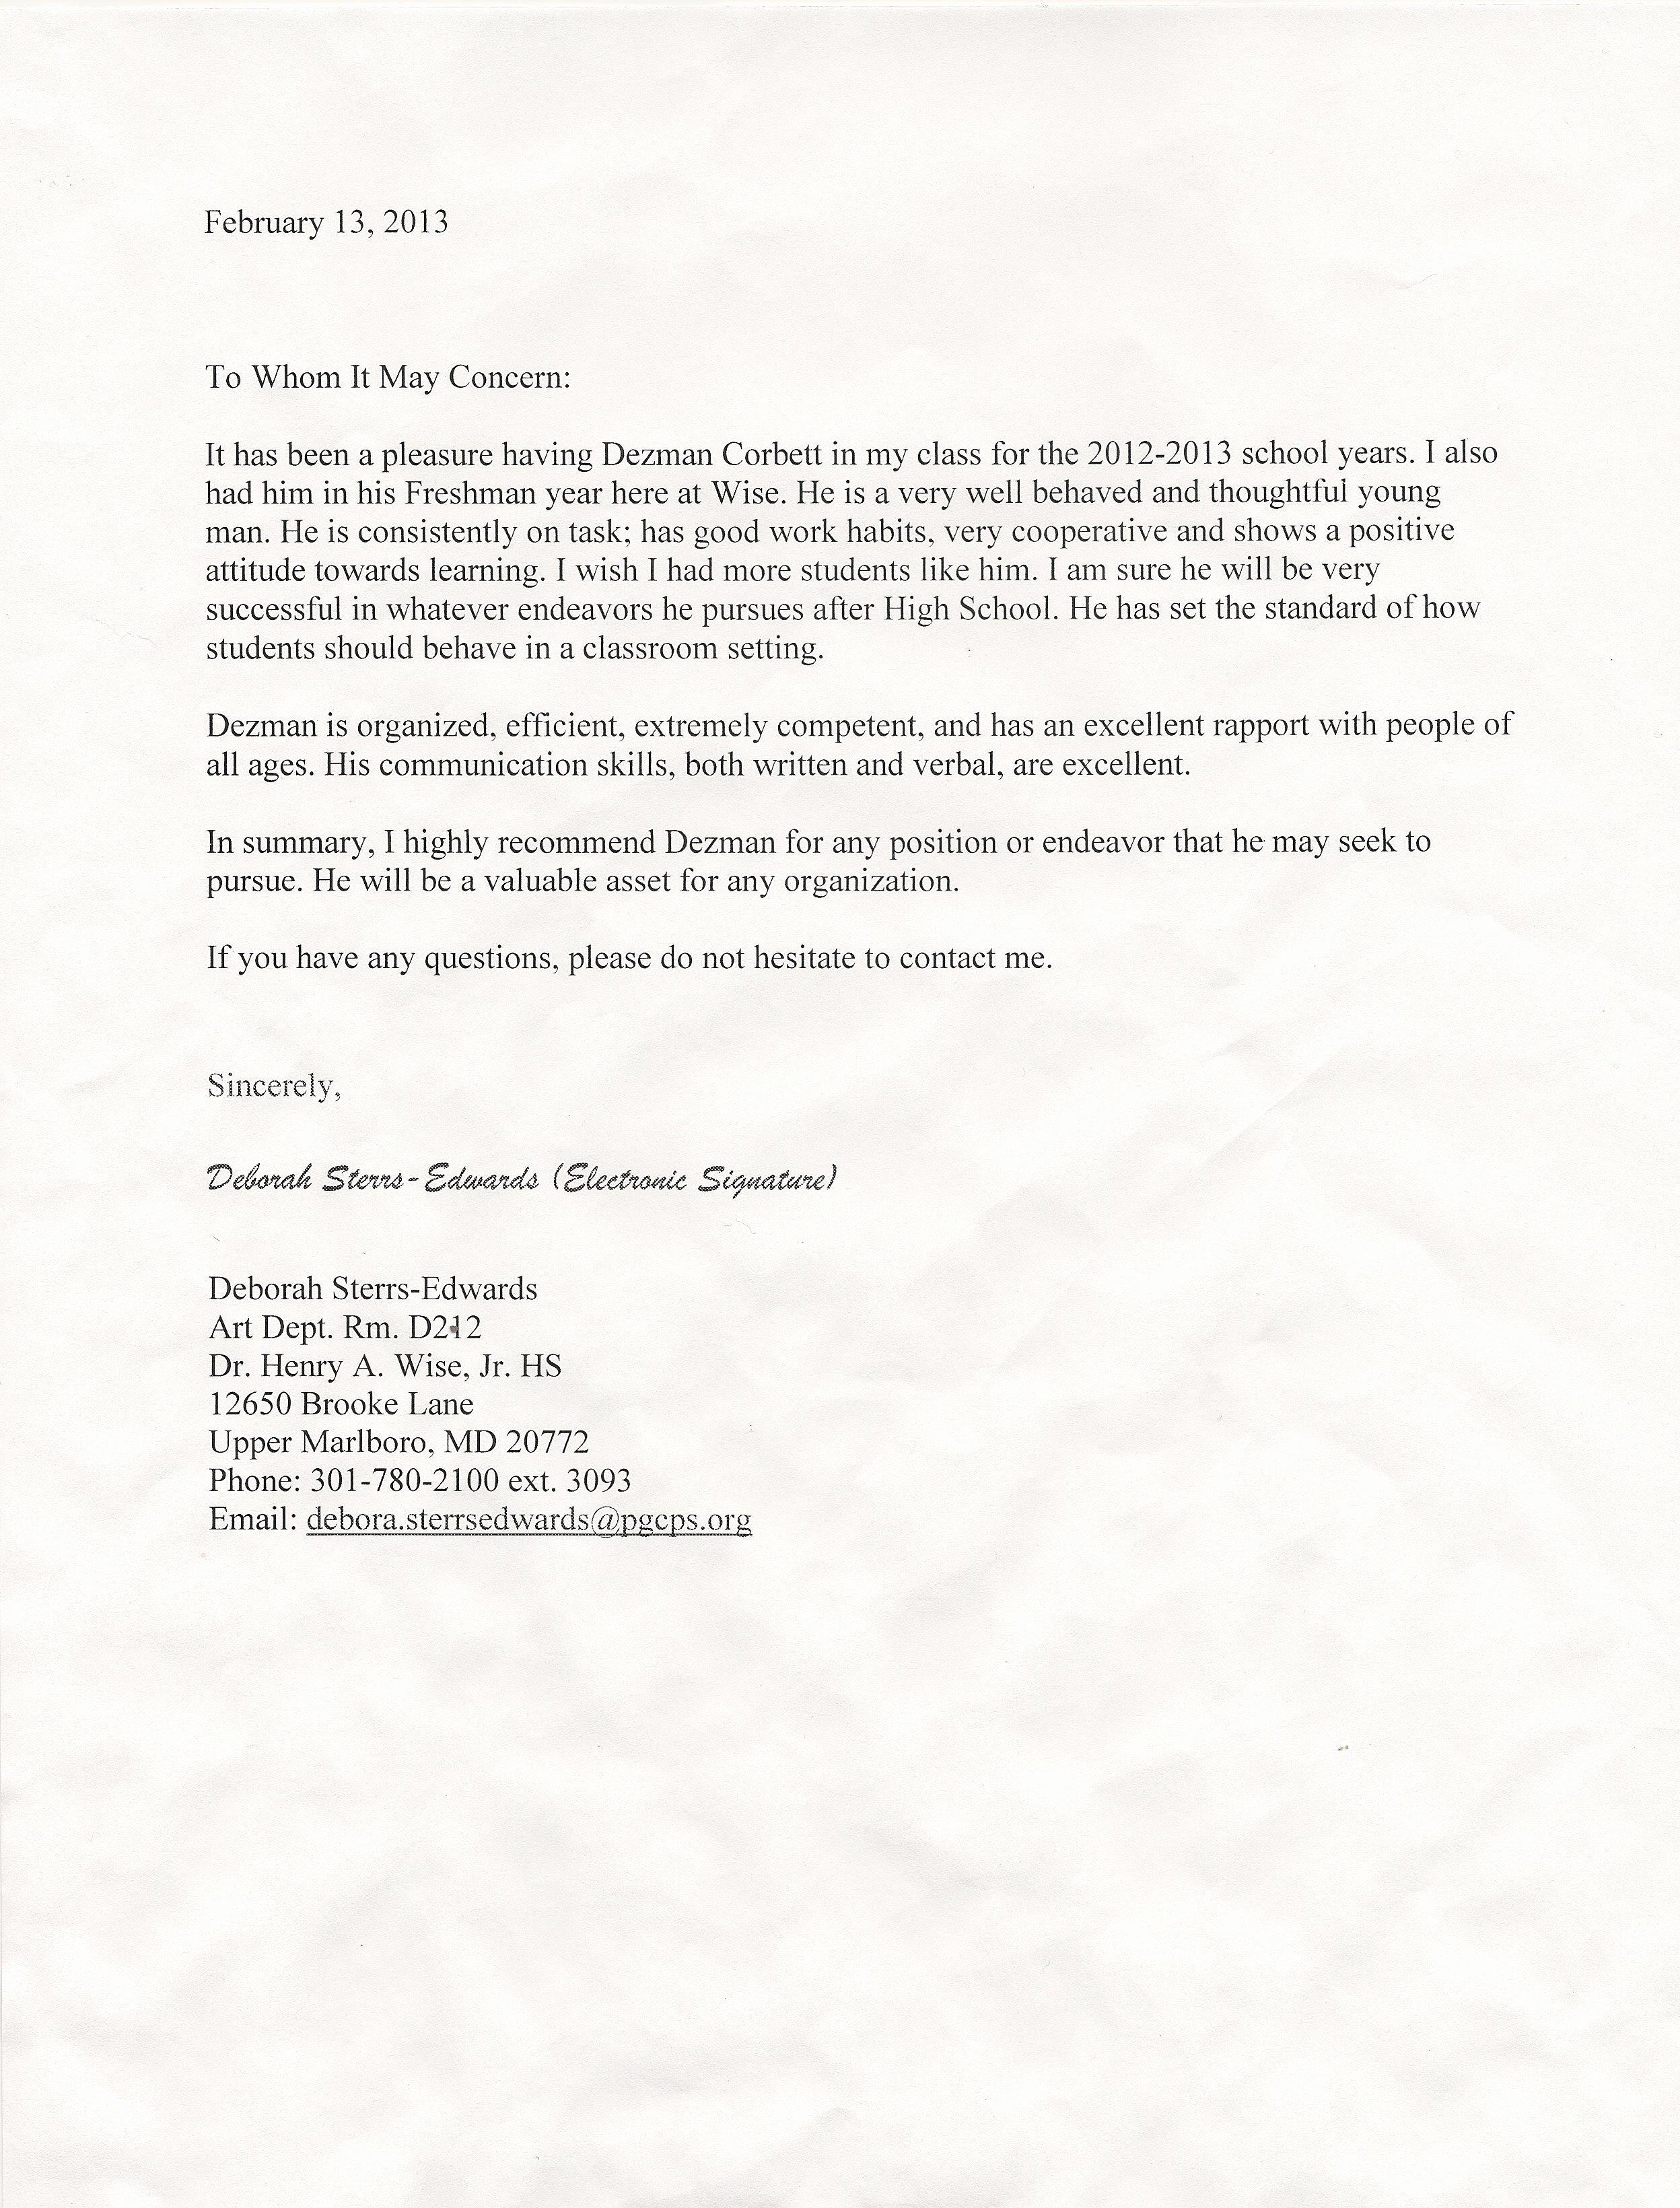 Recommendation Letter for Citizenship Fresh 30 Letter Re Mendation for Citizenship